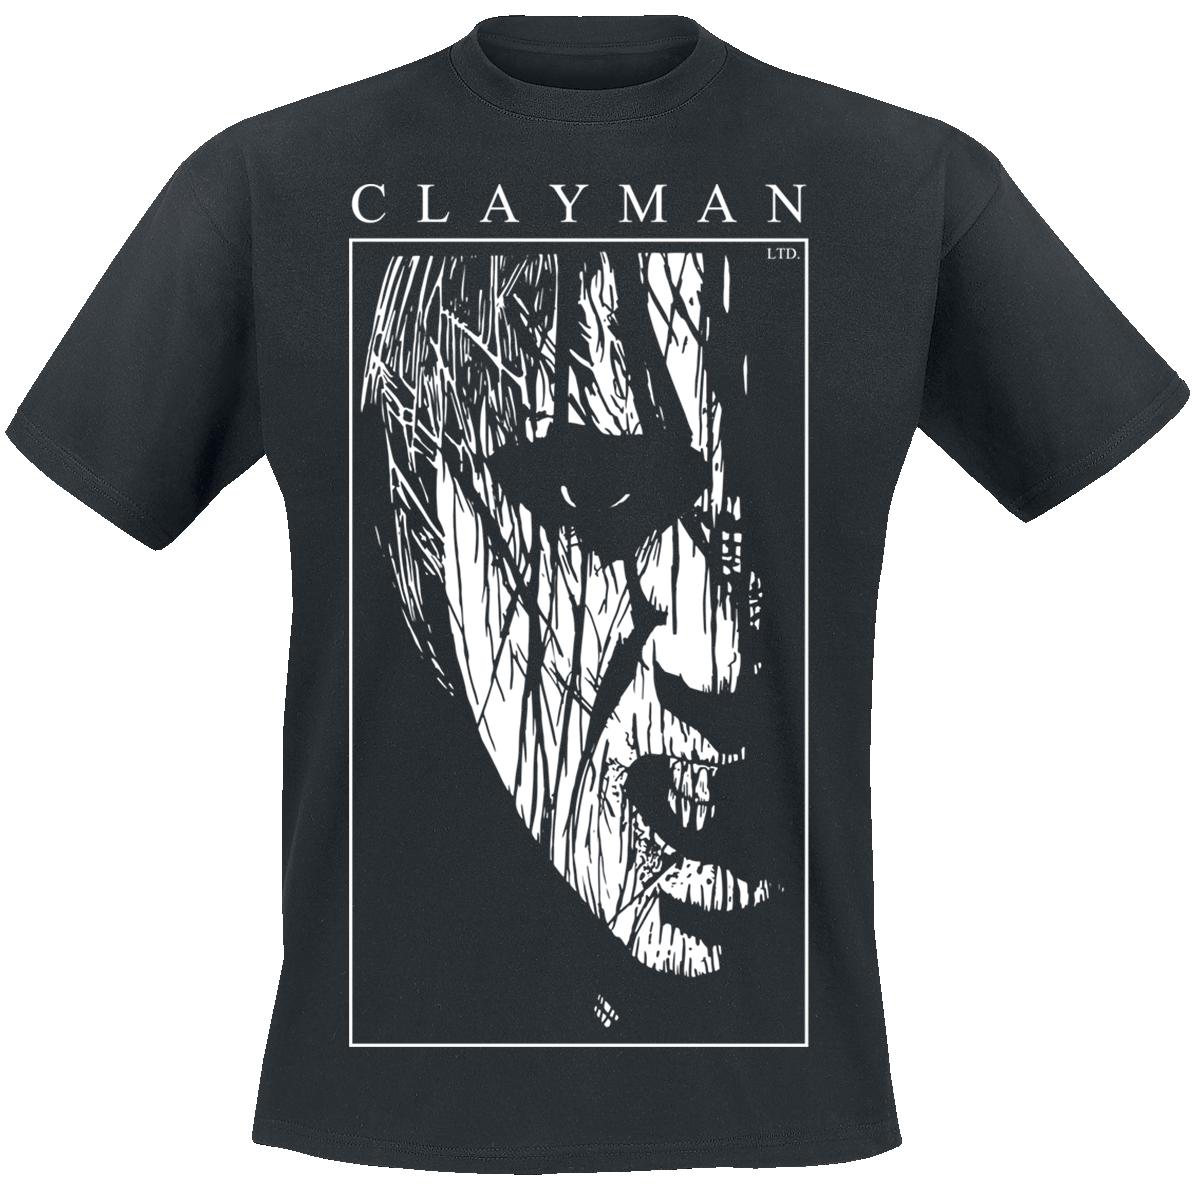 Clayman Ltd. - Dark Face - T-Shirt - black image